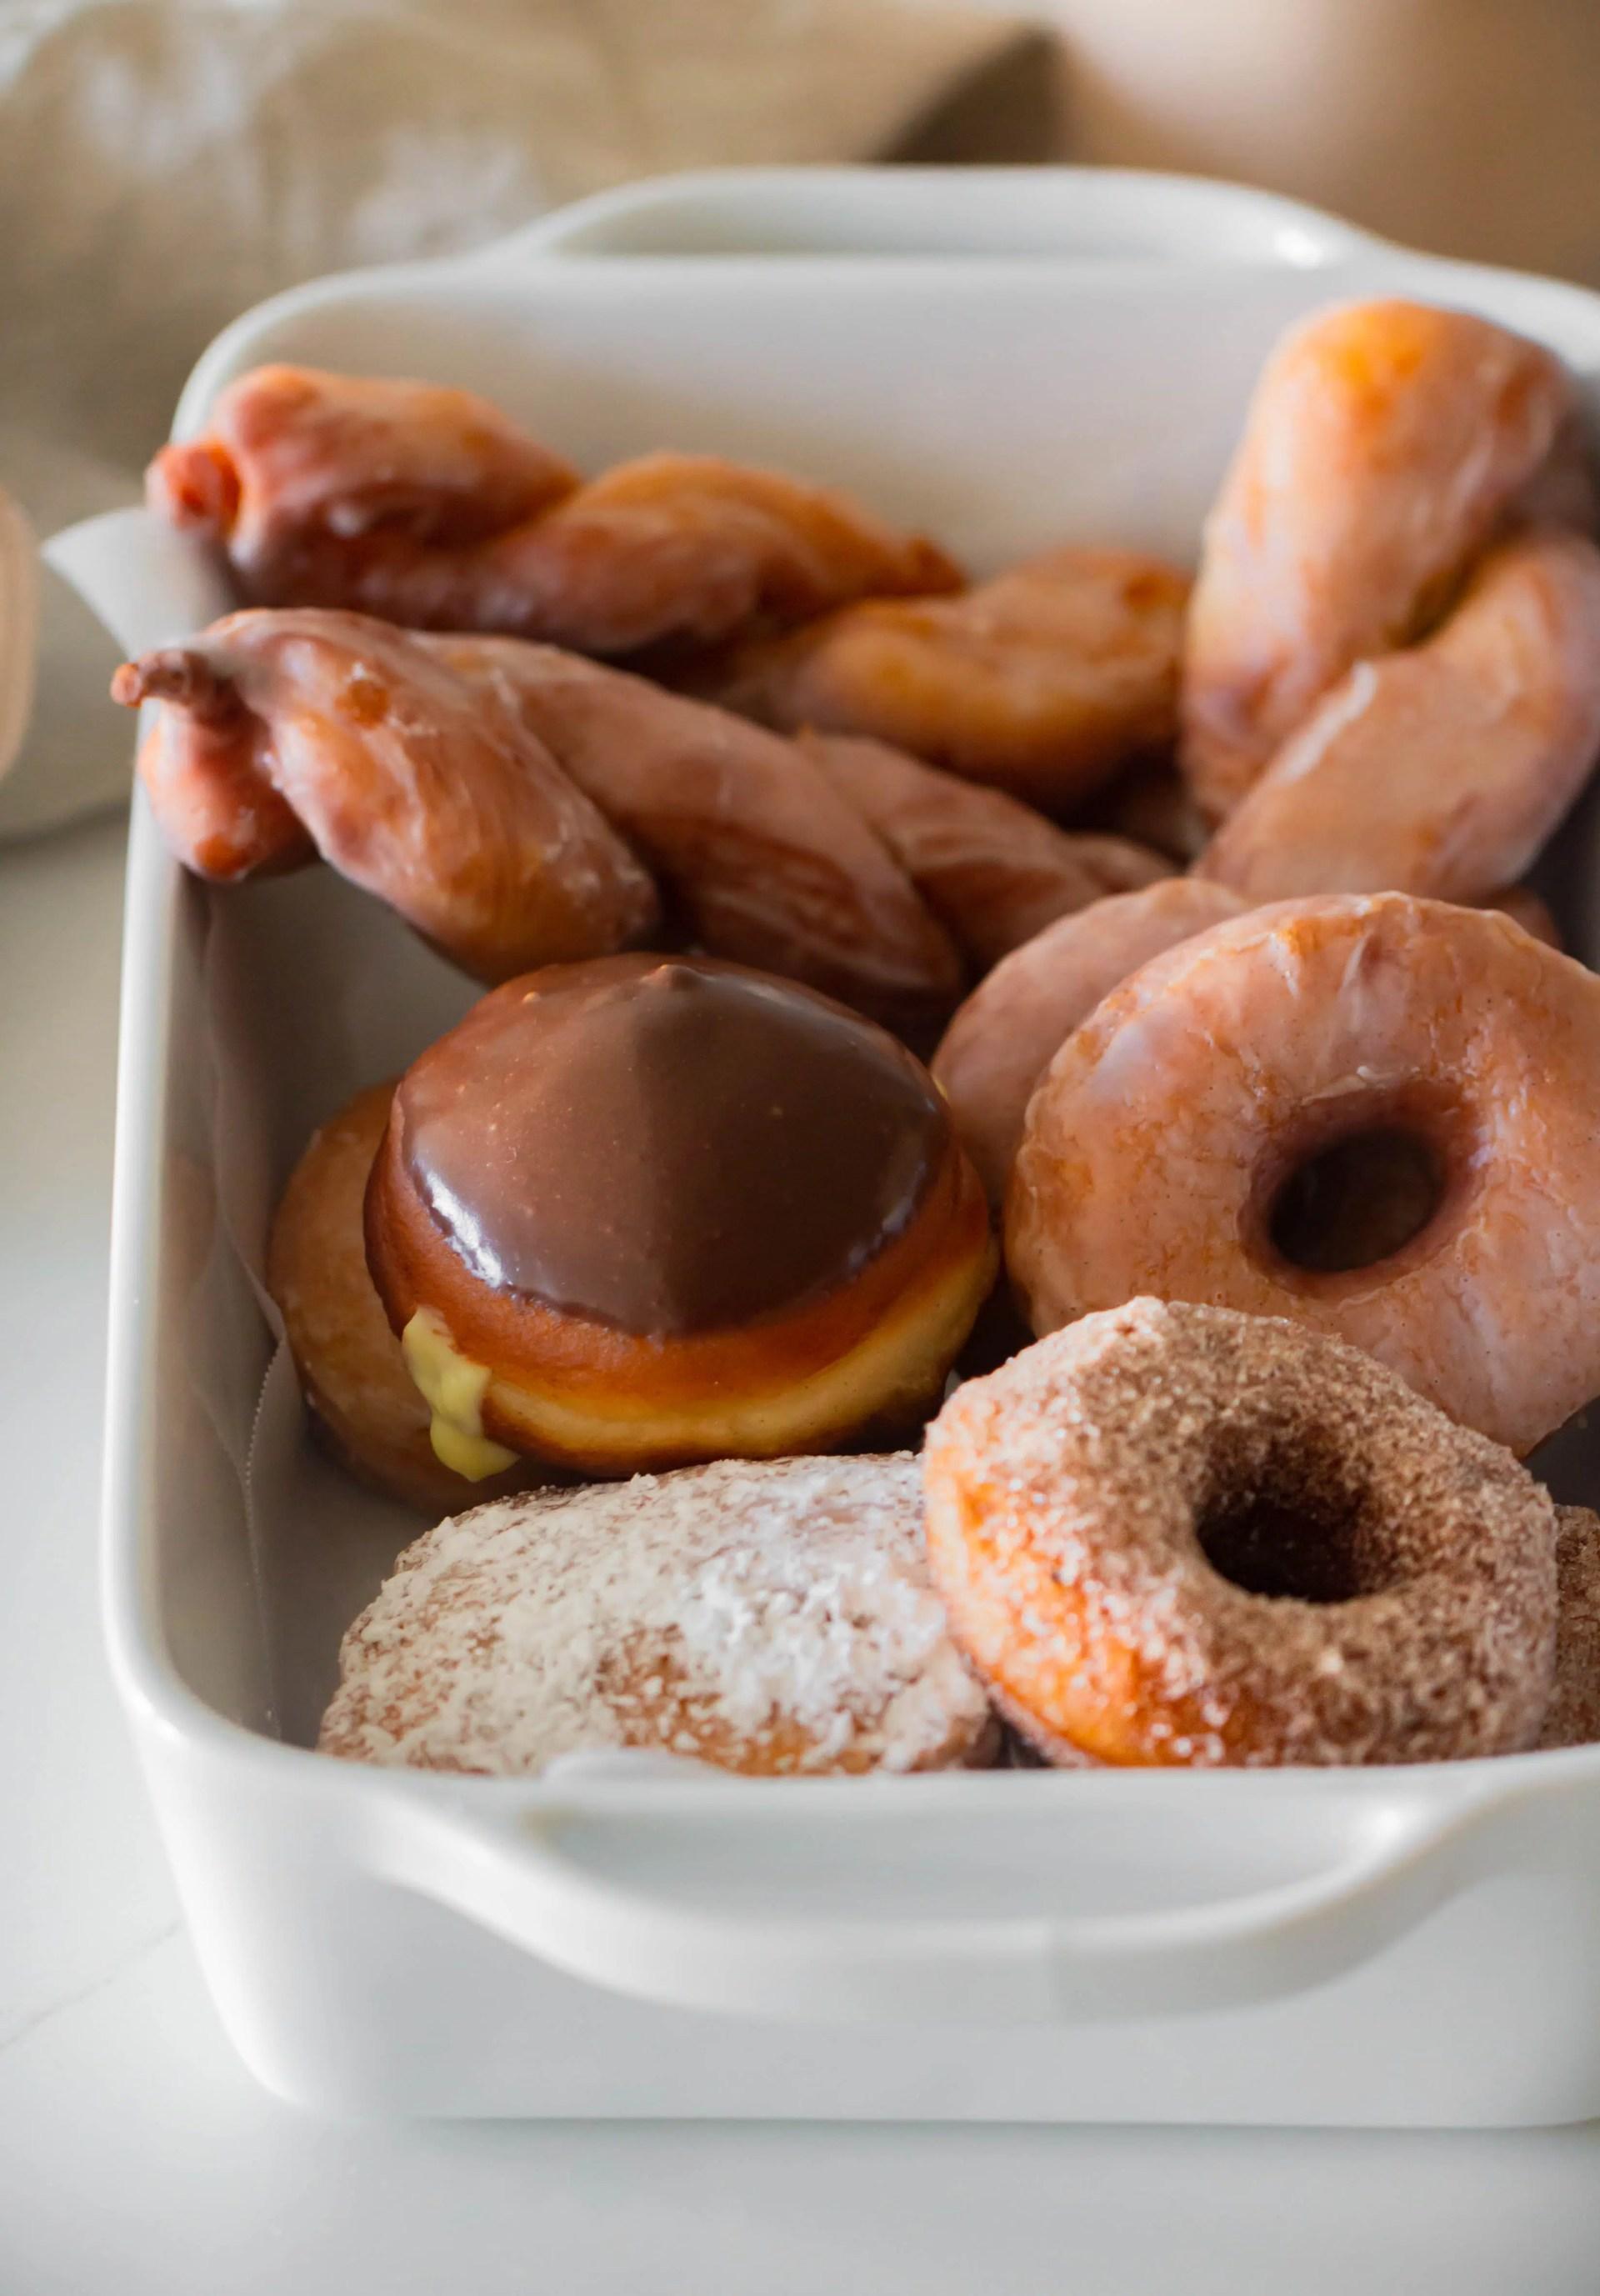 How to make homemade glazed donuts